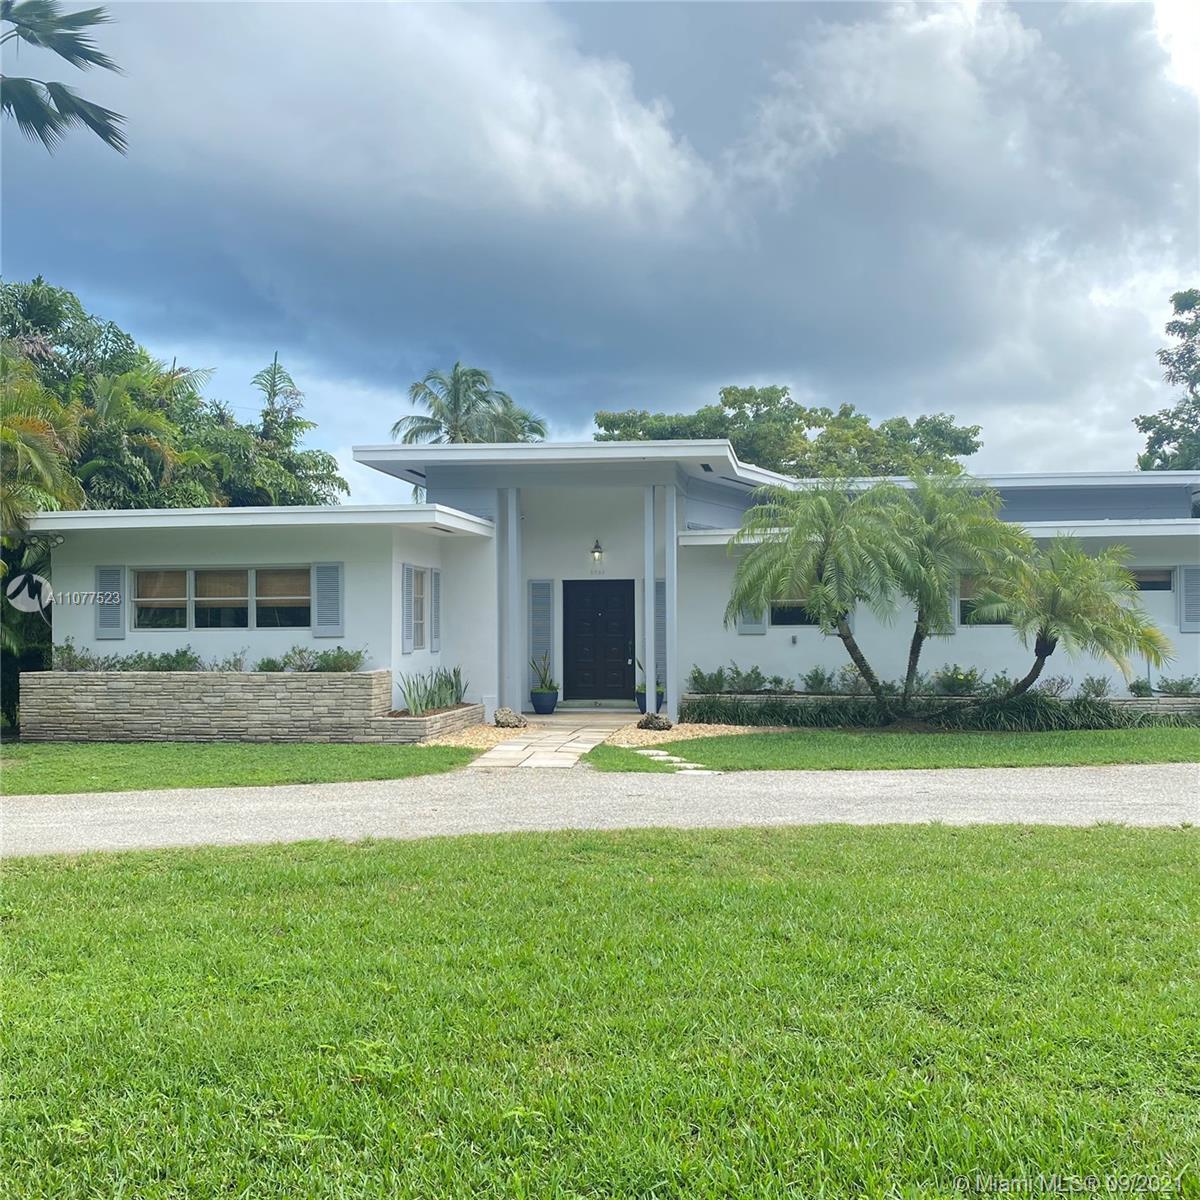 South Miami - 5290 N Kendall Dr, Coral Gables, FL 33156